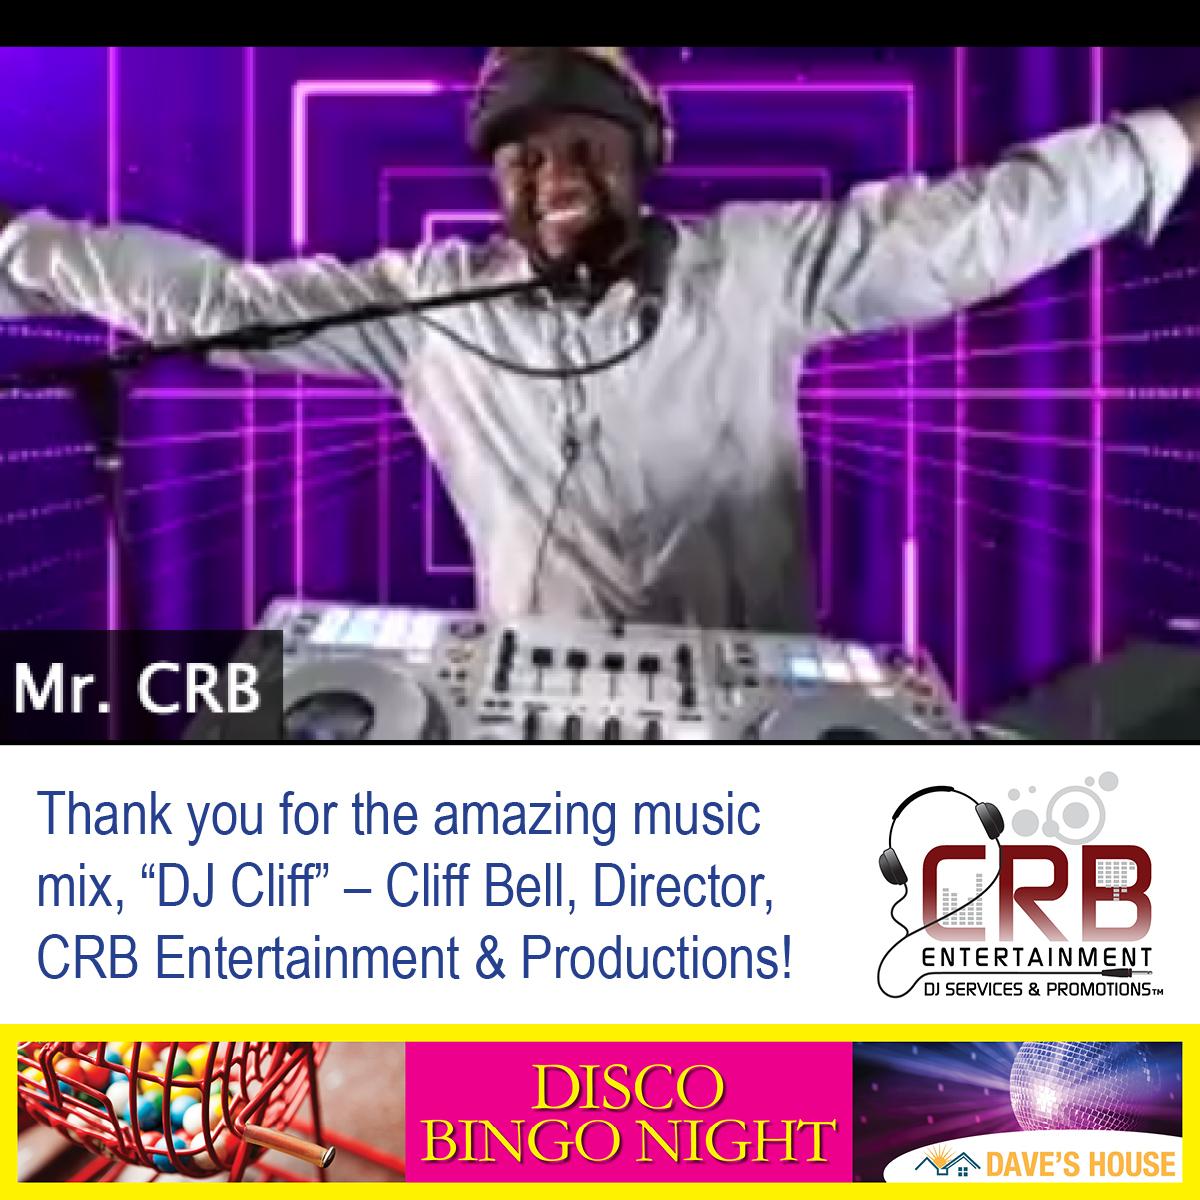 CRB Entertainment's DJ Cliff